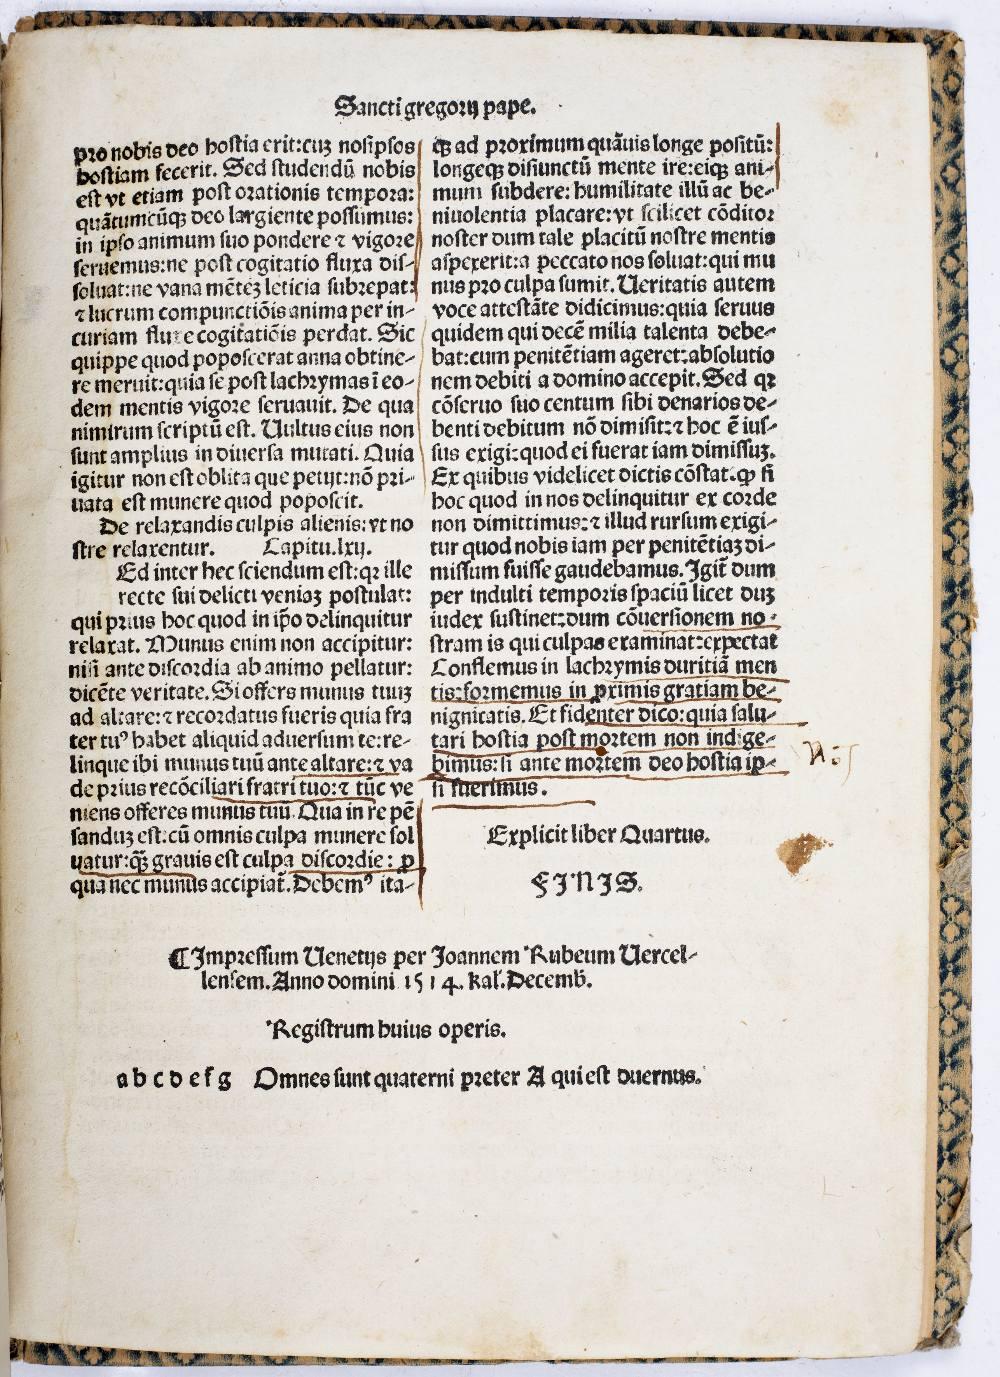 POPE GREGORY I (540-604) Dyalogus Sancti Joannem Rubeum Vercellensem. Venice December 1514. 4 - Image 2 of 4